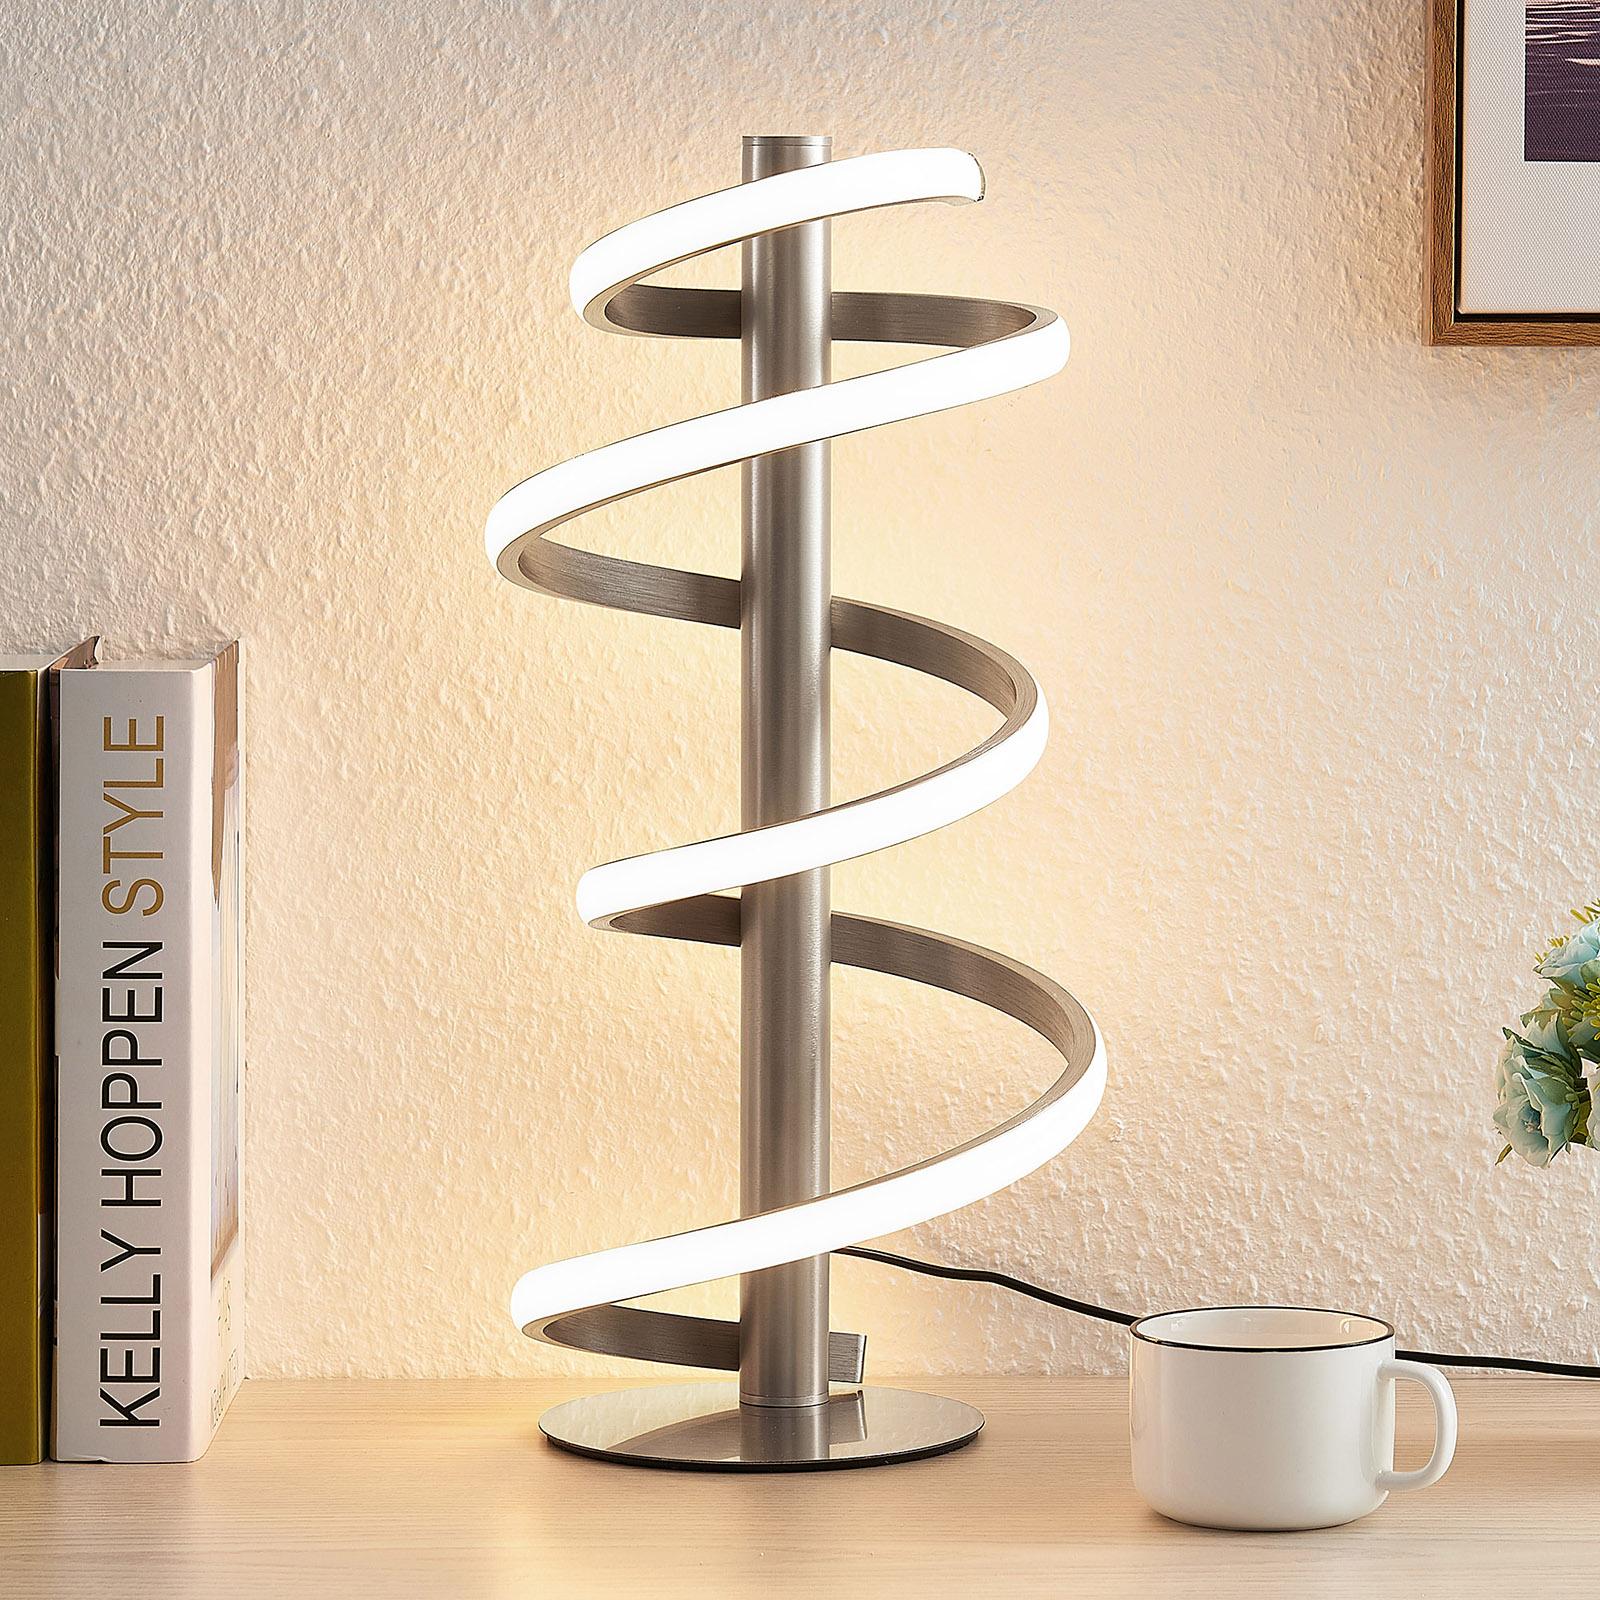 Lucande Milora lámpara de mesa LED níquel satinado